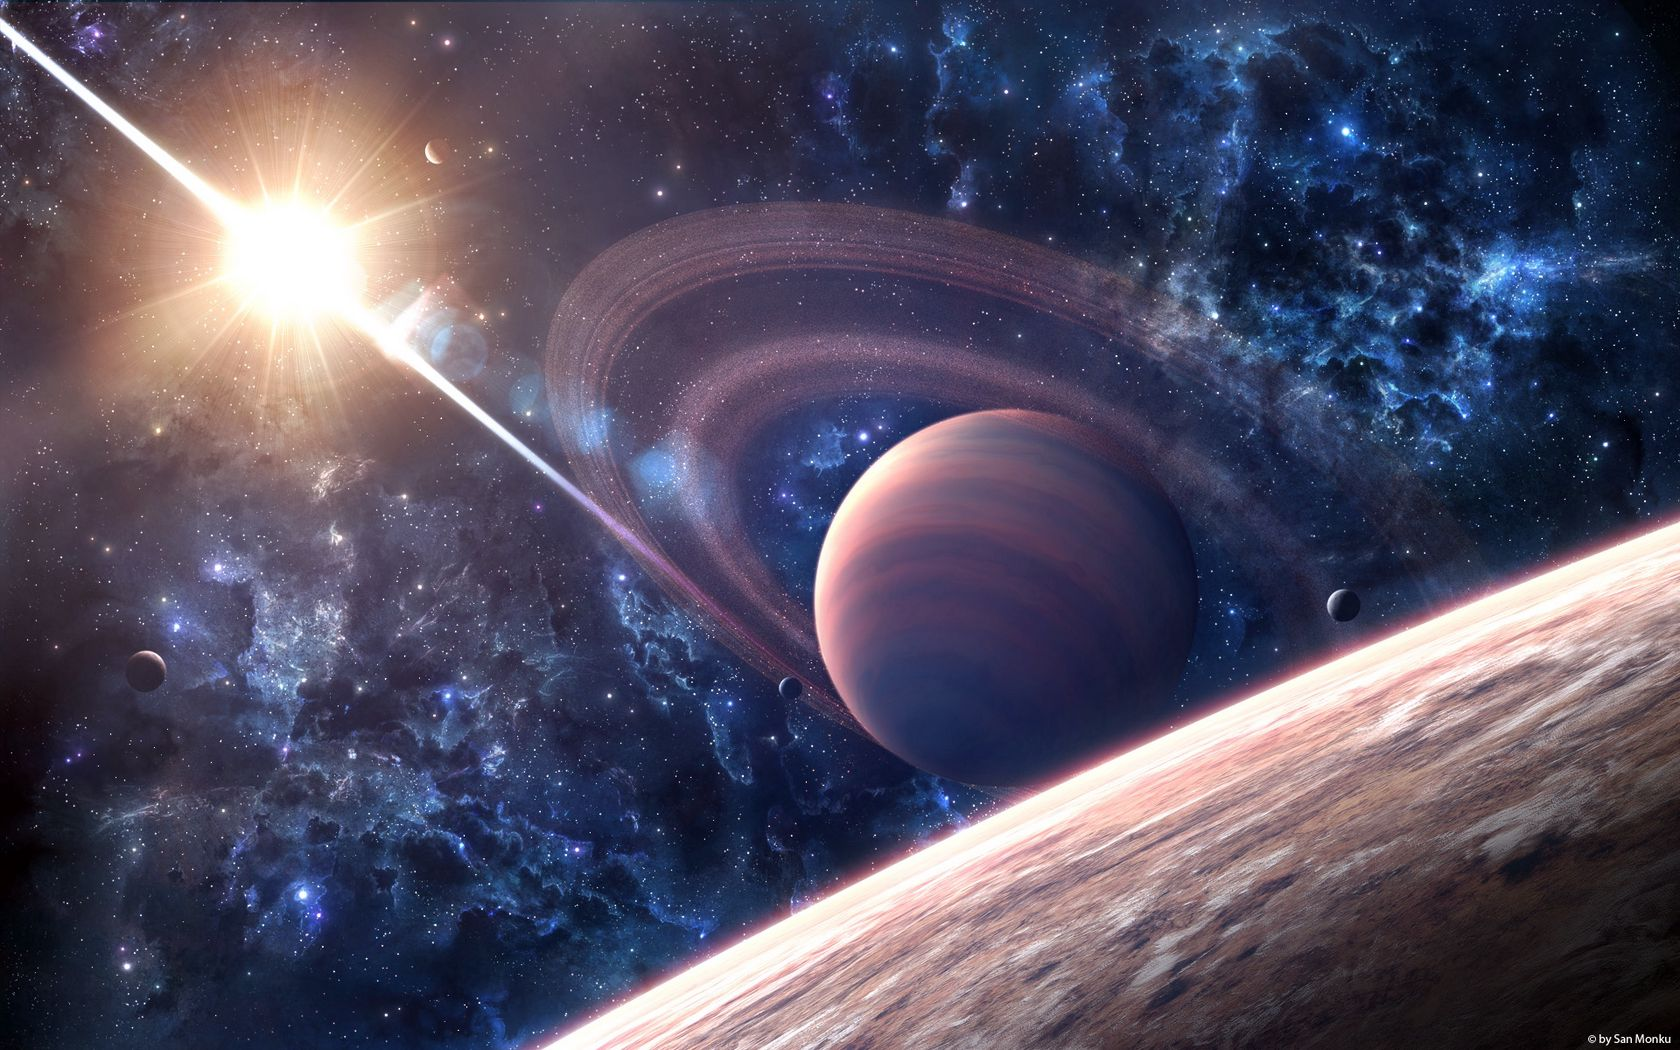 1680x1050 Wallpaper space, galaxy, saturn, planet